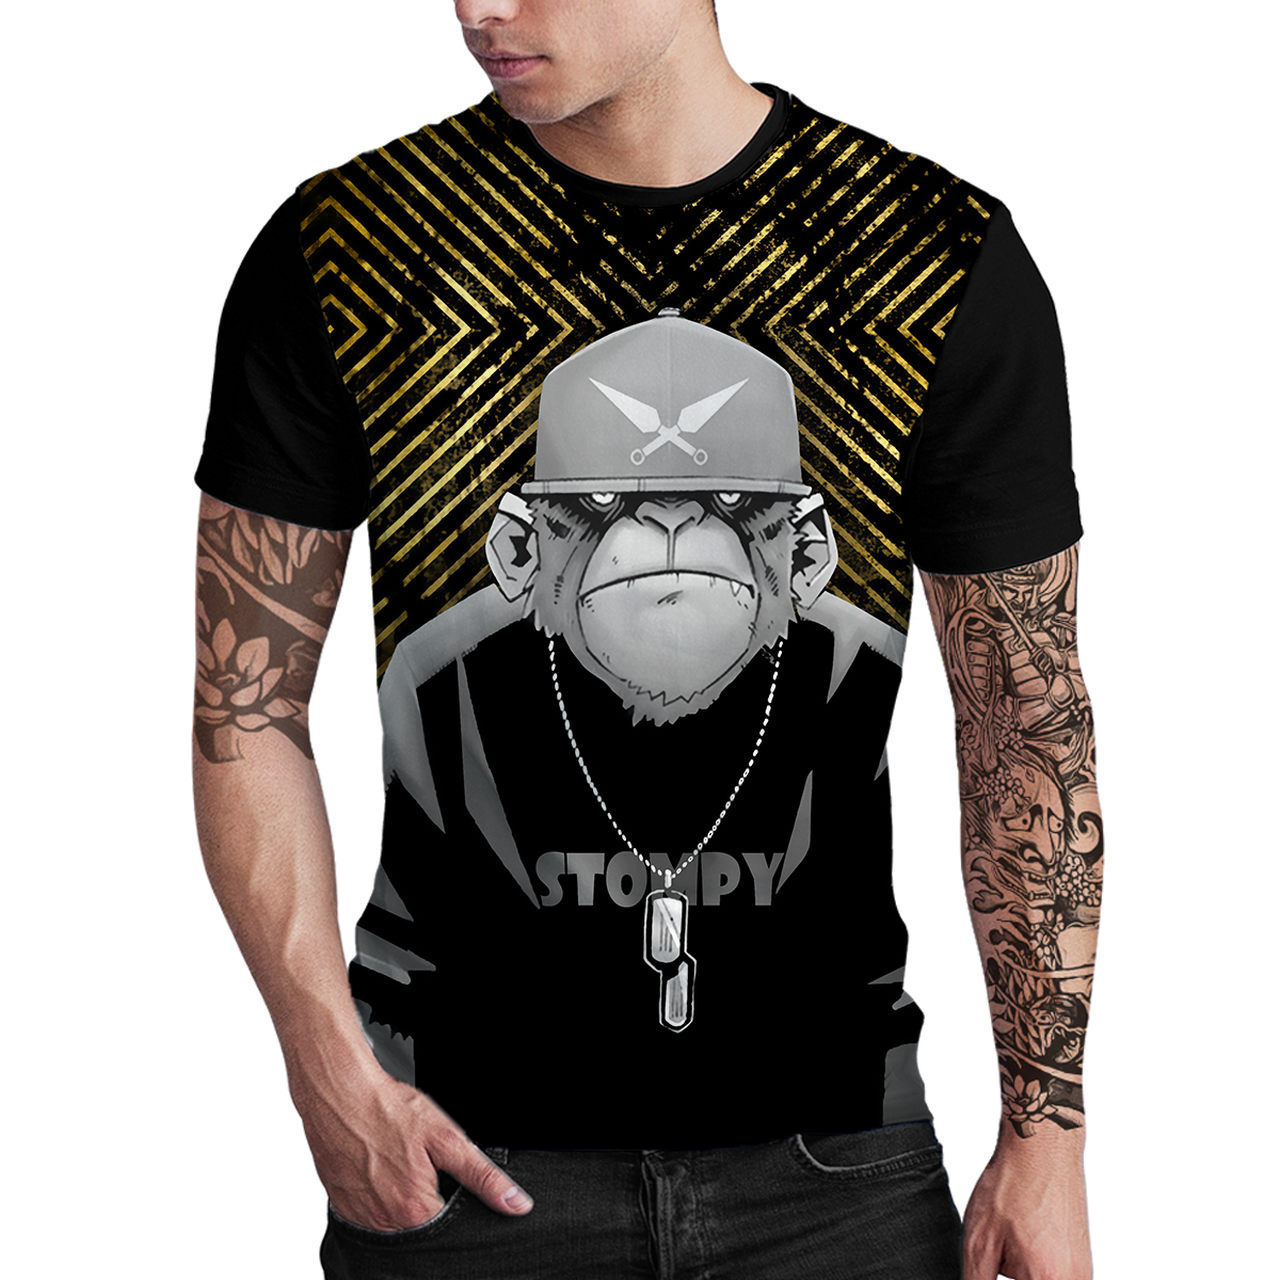 Stompy Camiseta Estampada Masculina Modelo 26